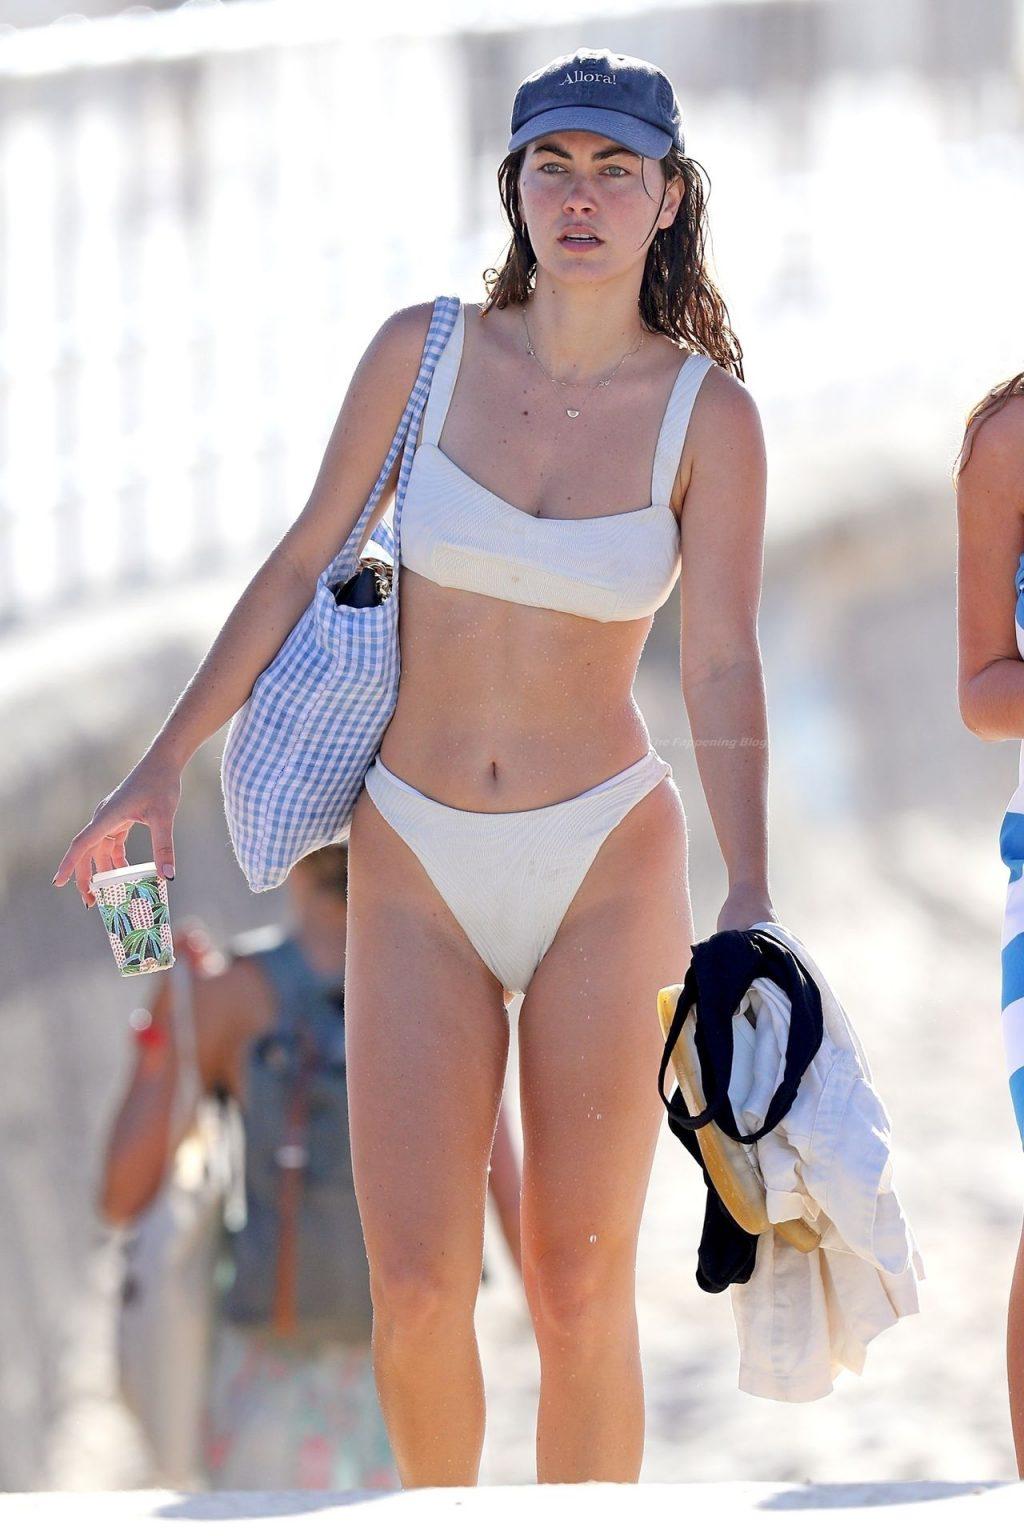 Charlotte Best Hits Bondi Beach Wearing a White Bikini (20 Photos)